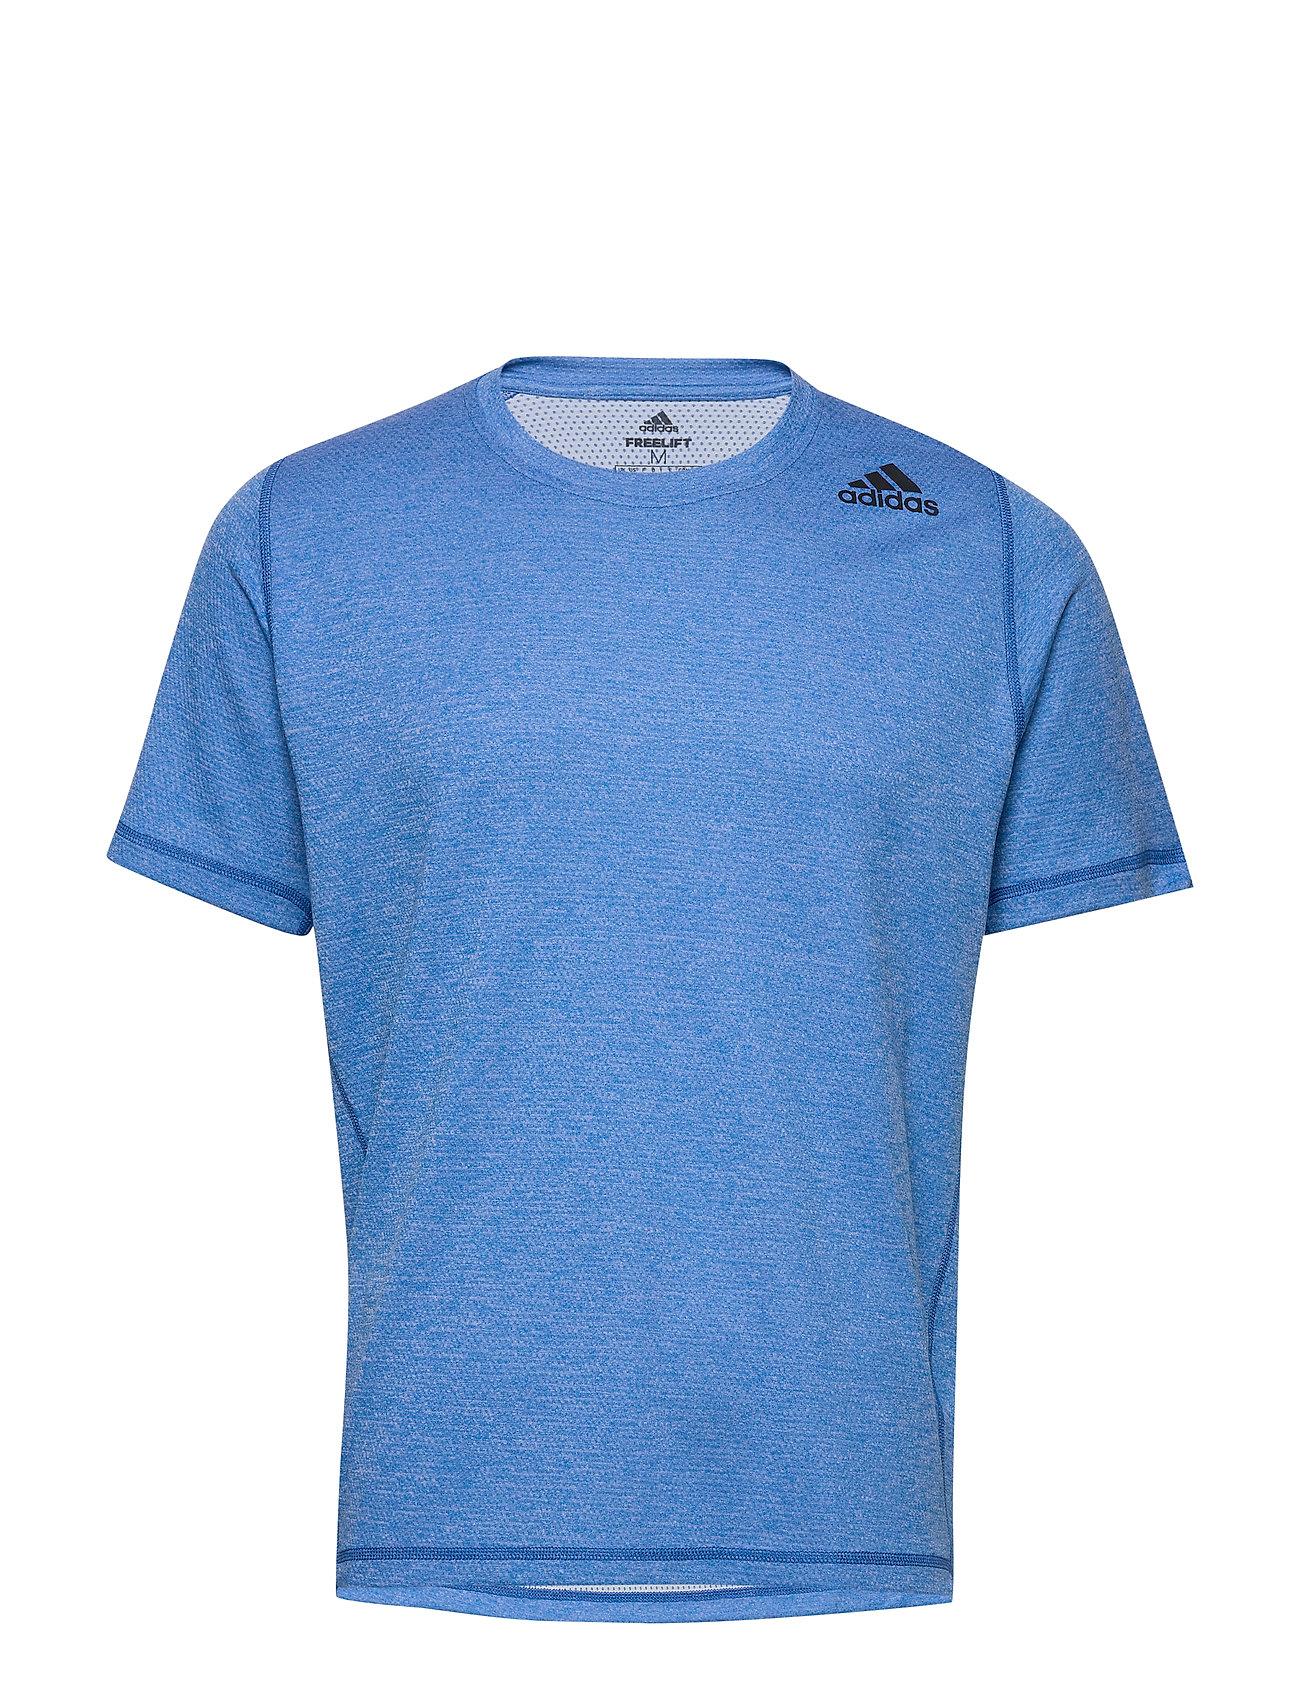 Image of Fl Trg Tee T-shirt Blå Adidas Performance (3421206561)